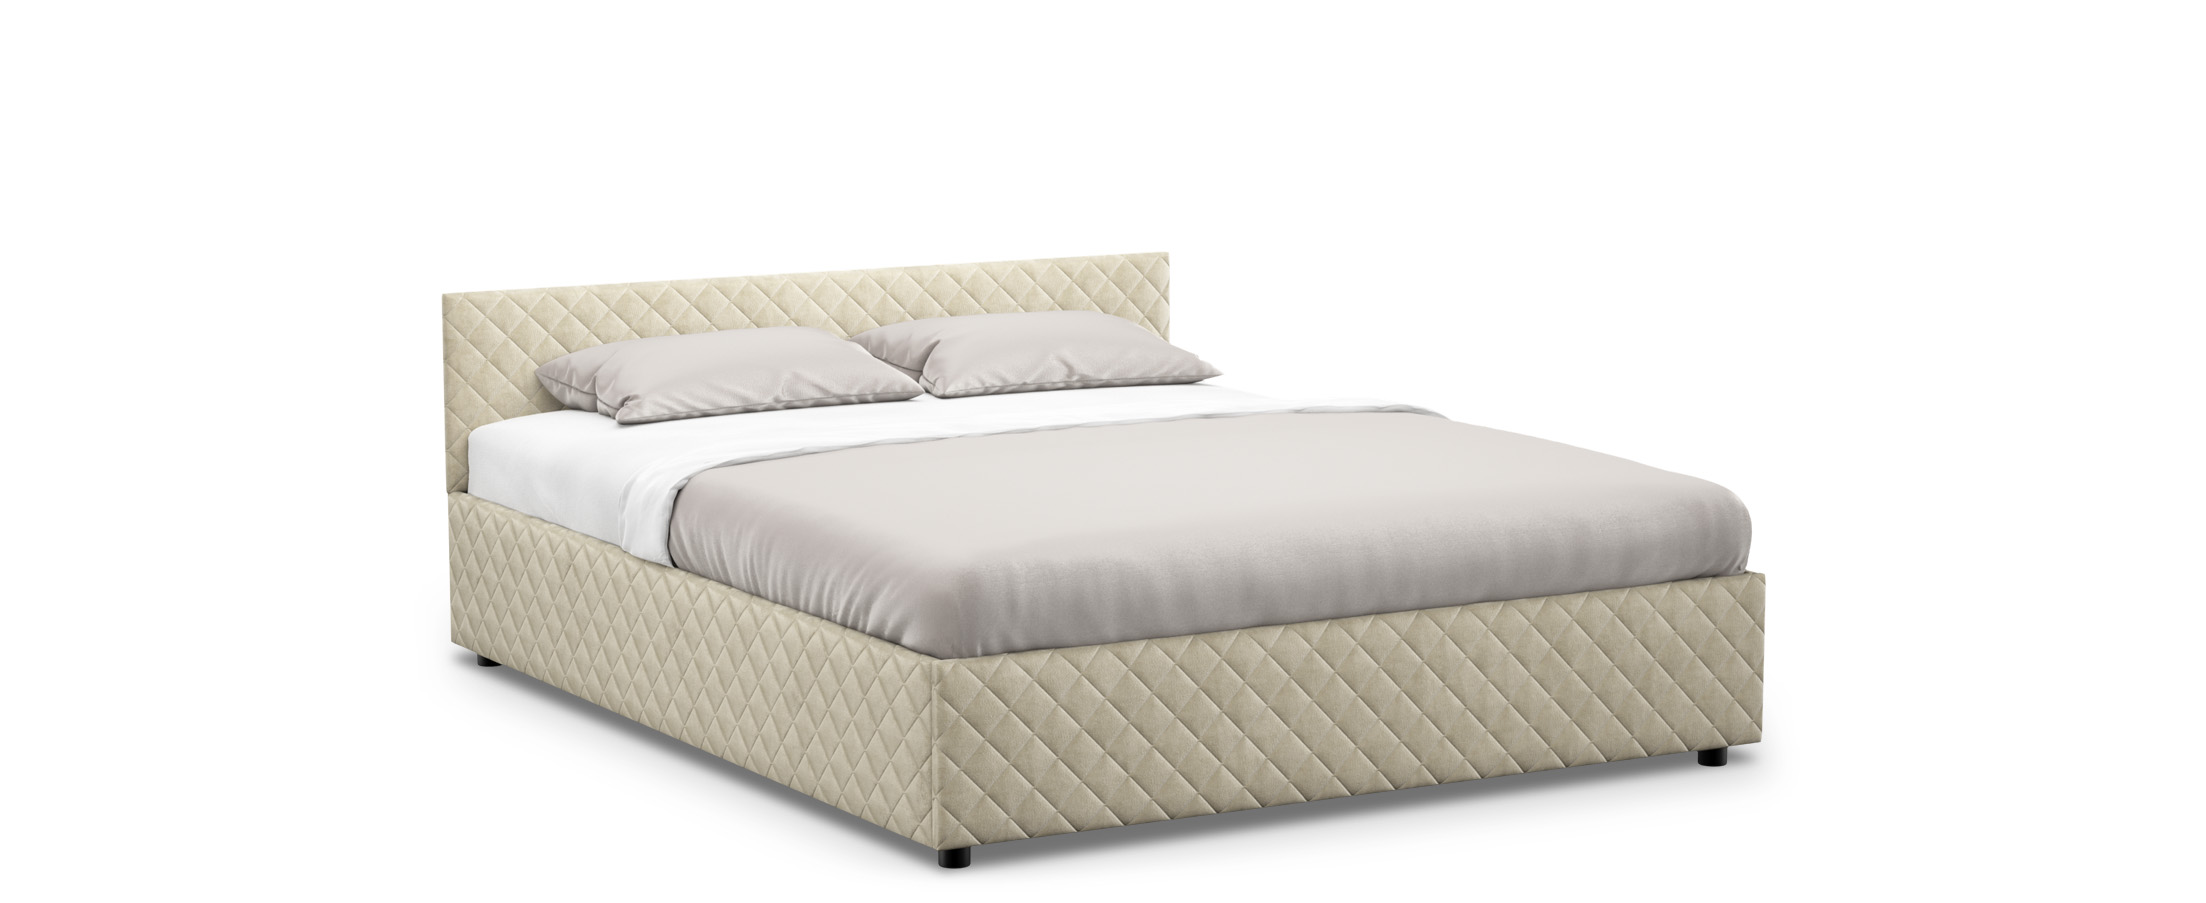 Кровать двуспальная Prima Style New 160х200 Модель 1221 фото